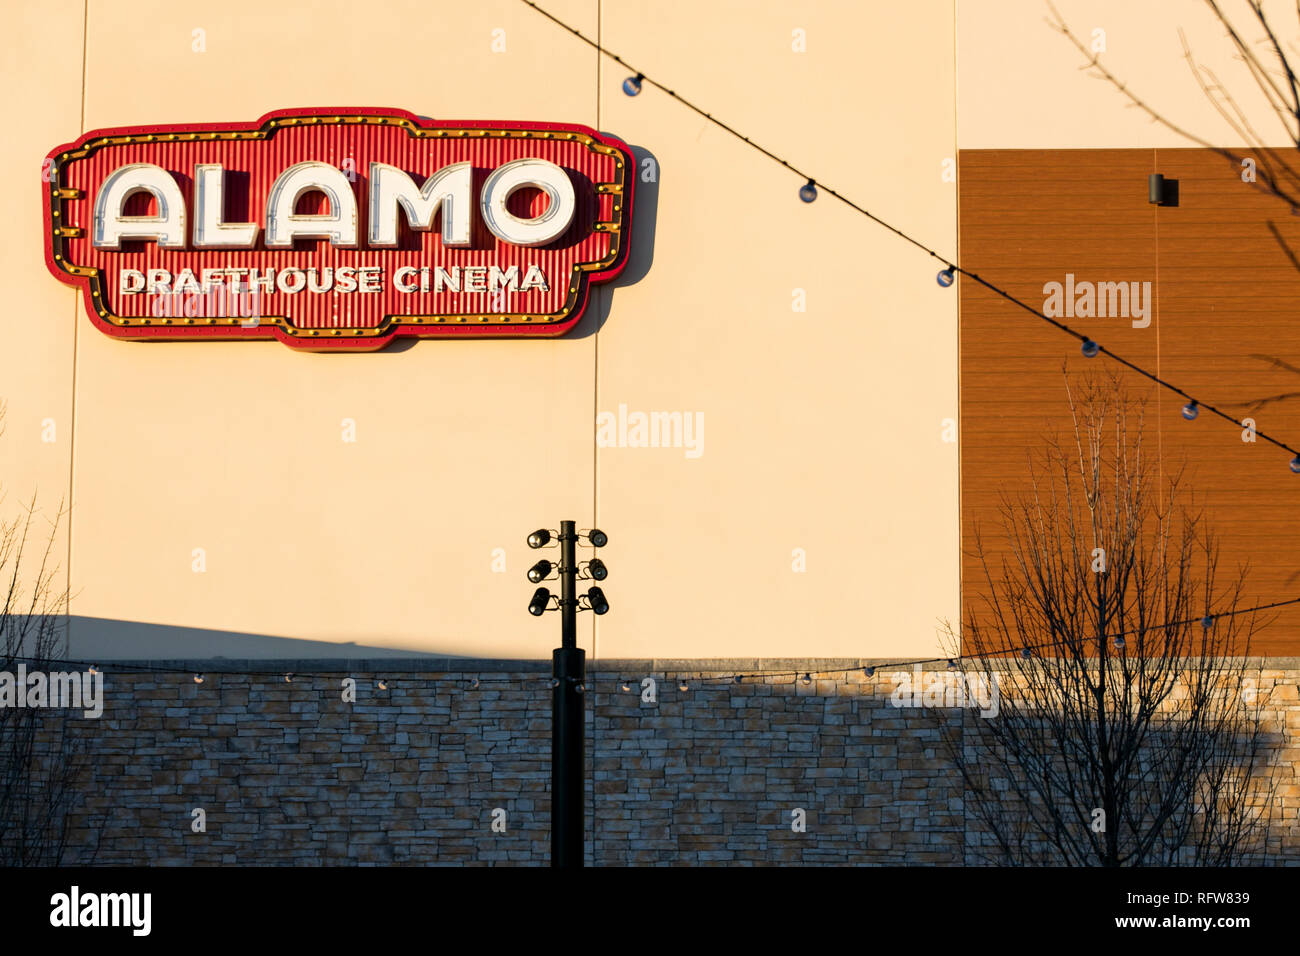 A logo sign outside of an Alamo Drafthouse Cinema location in Woodbridge, Virginia, on January 21, 2019. - Stock Image